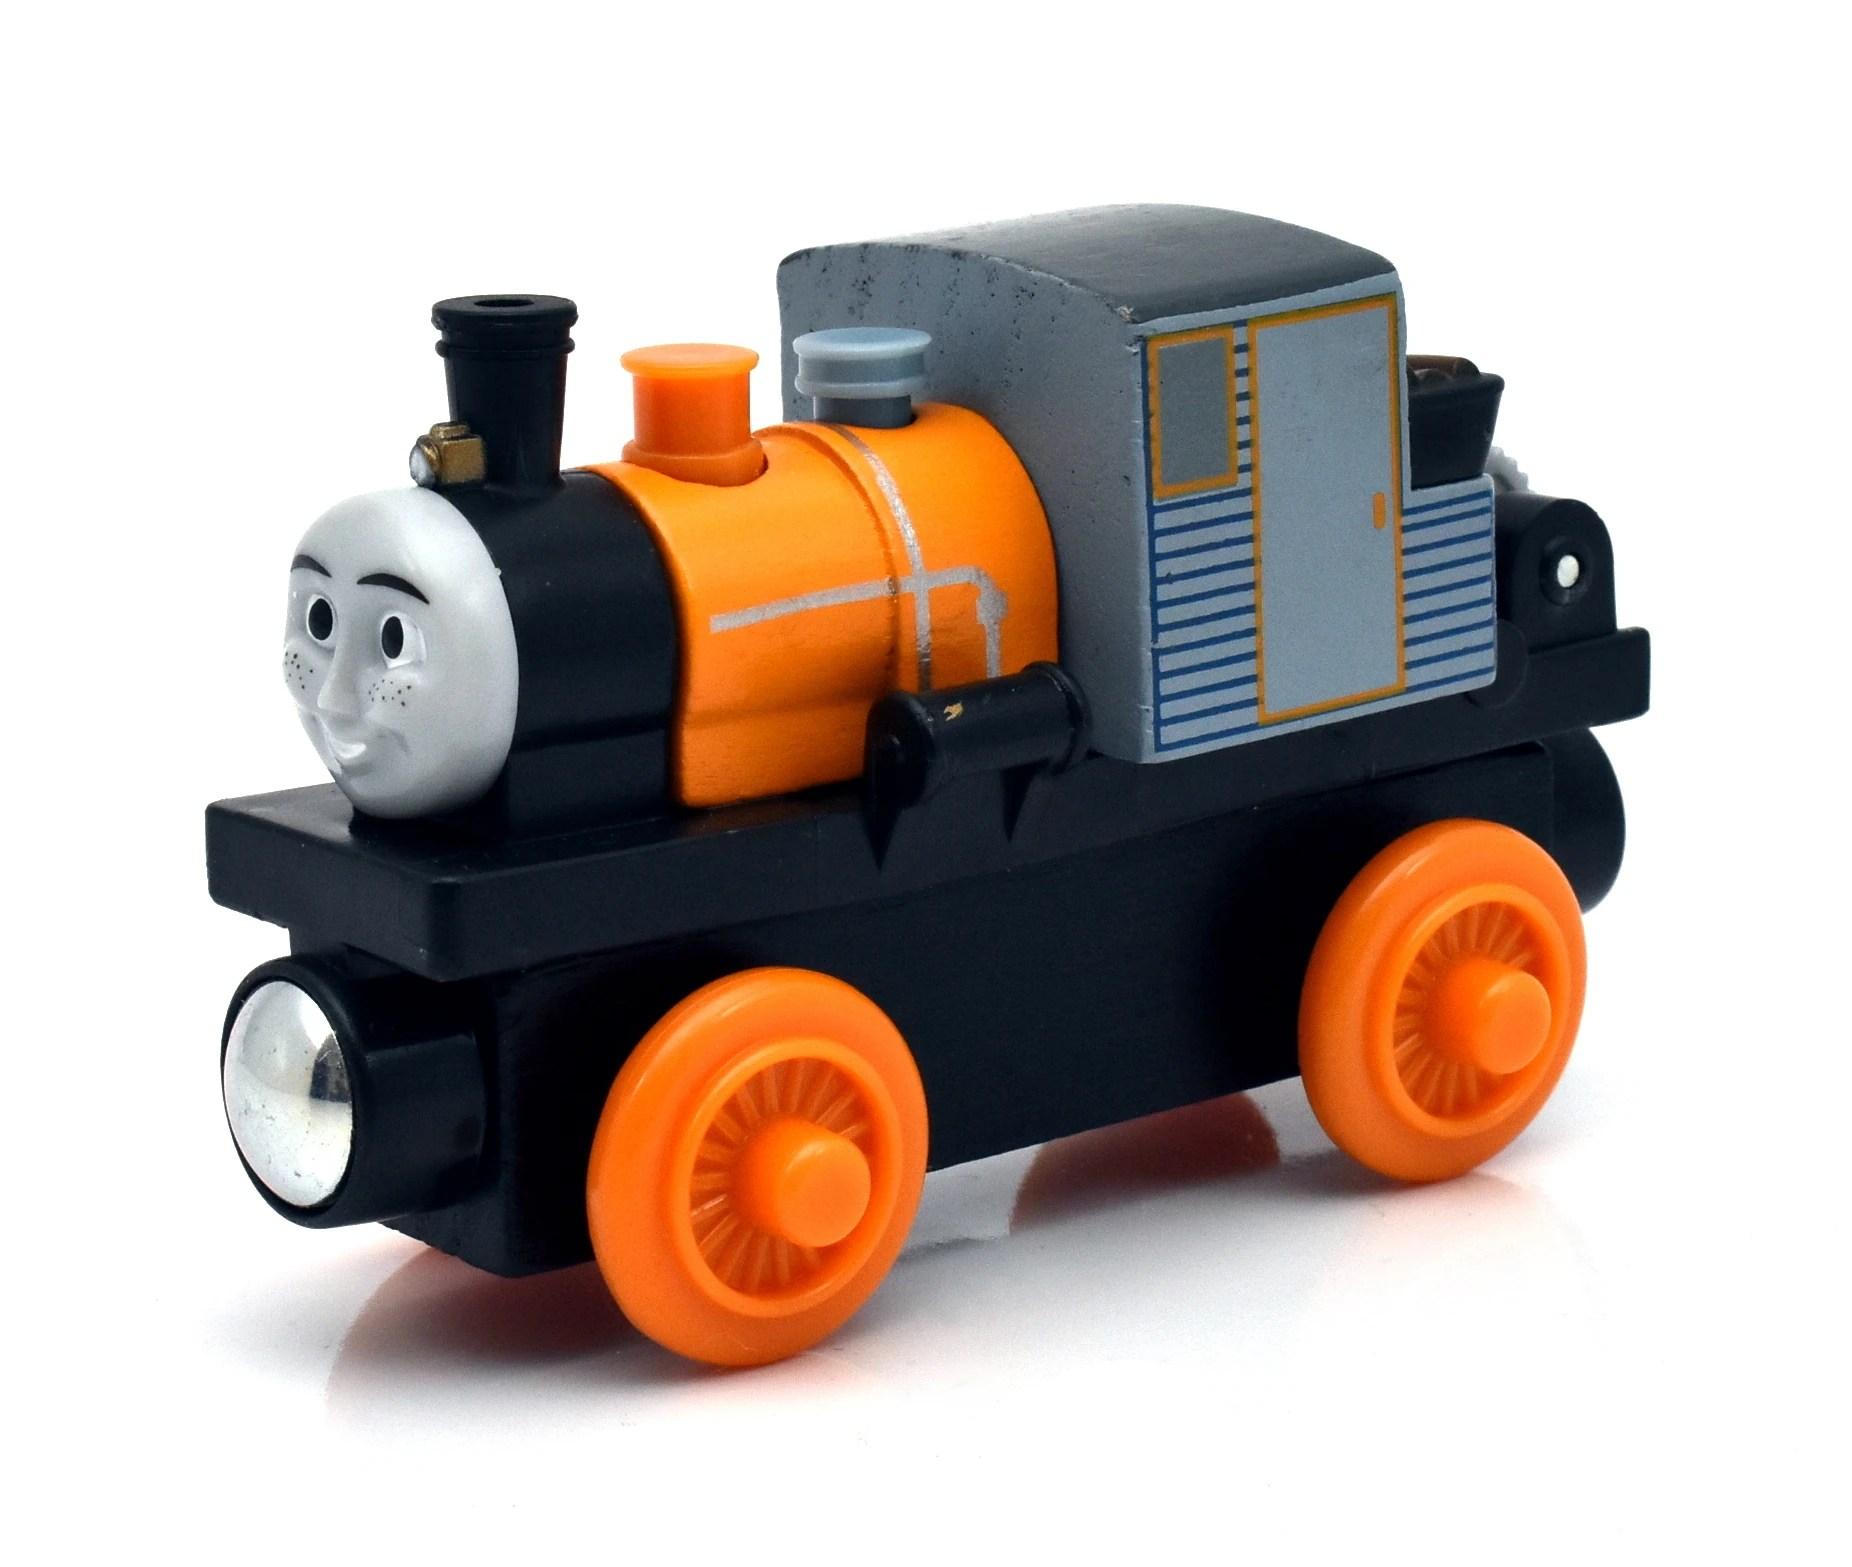 2016 Yearbook Thomas Wooden Railway